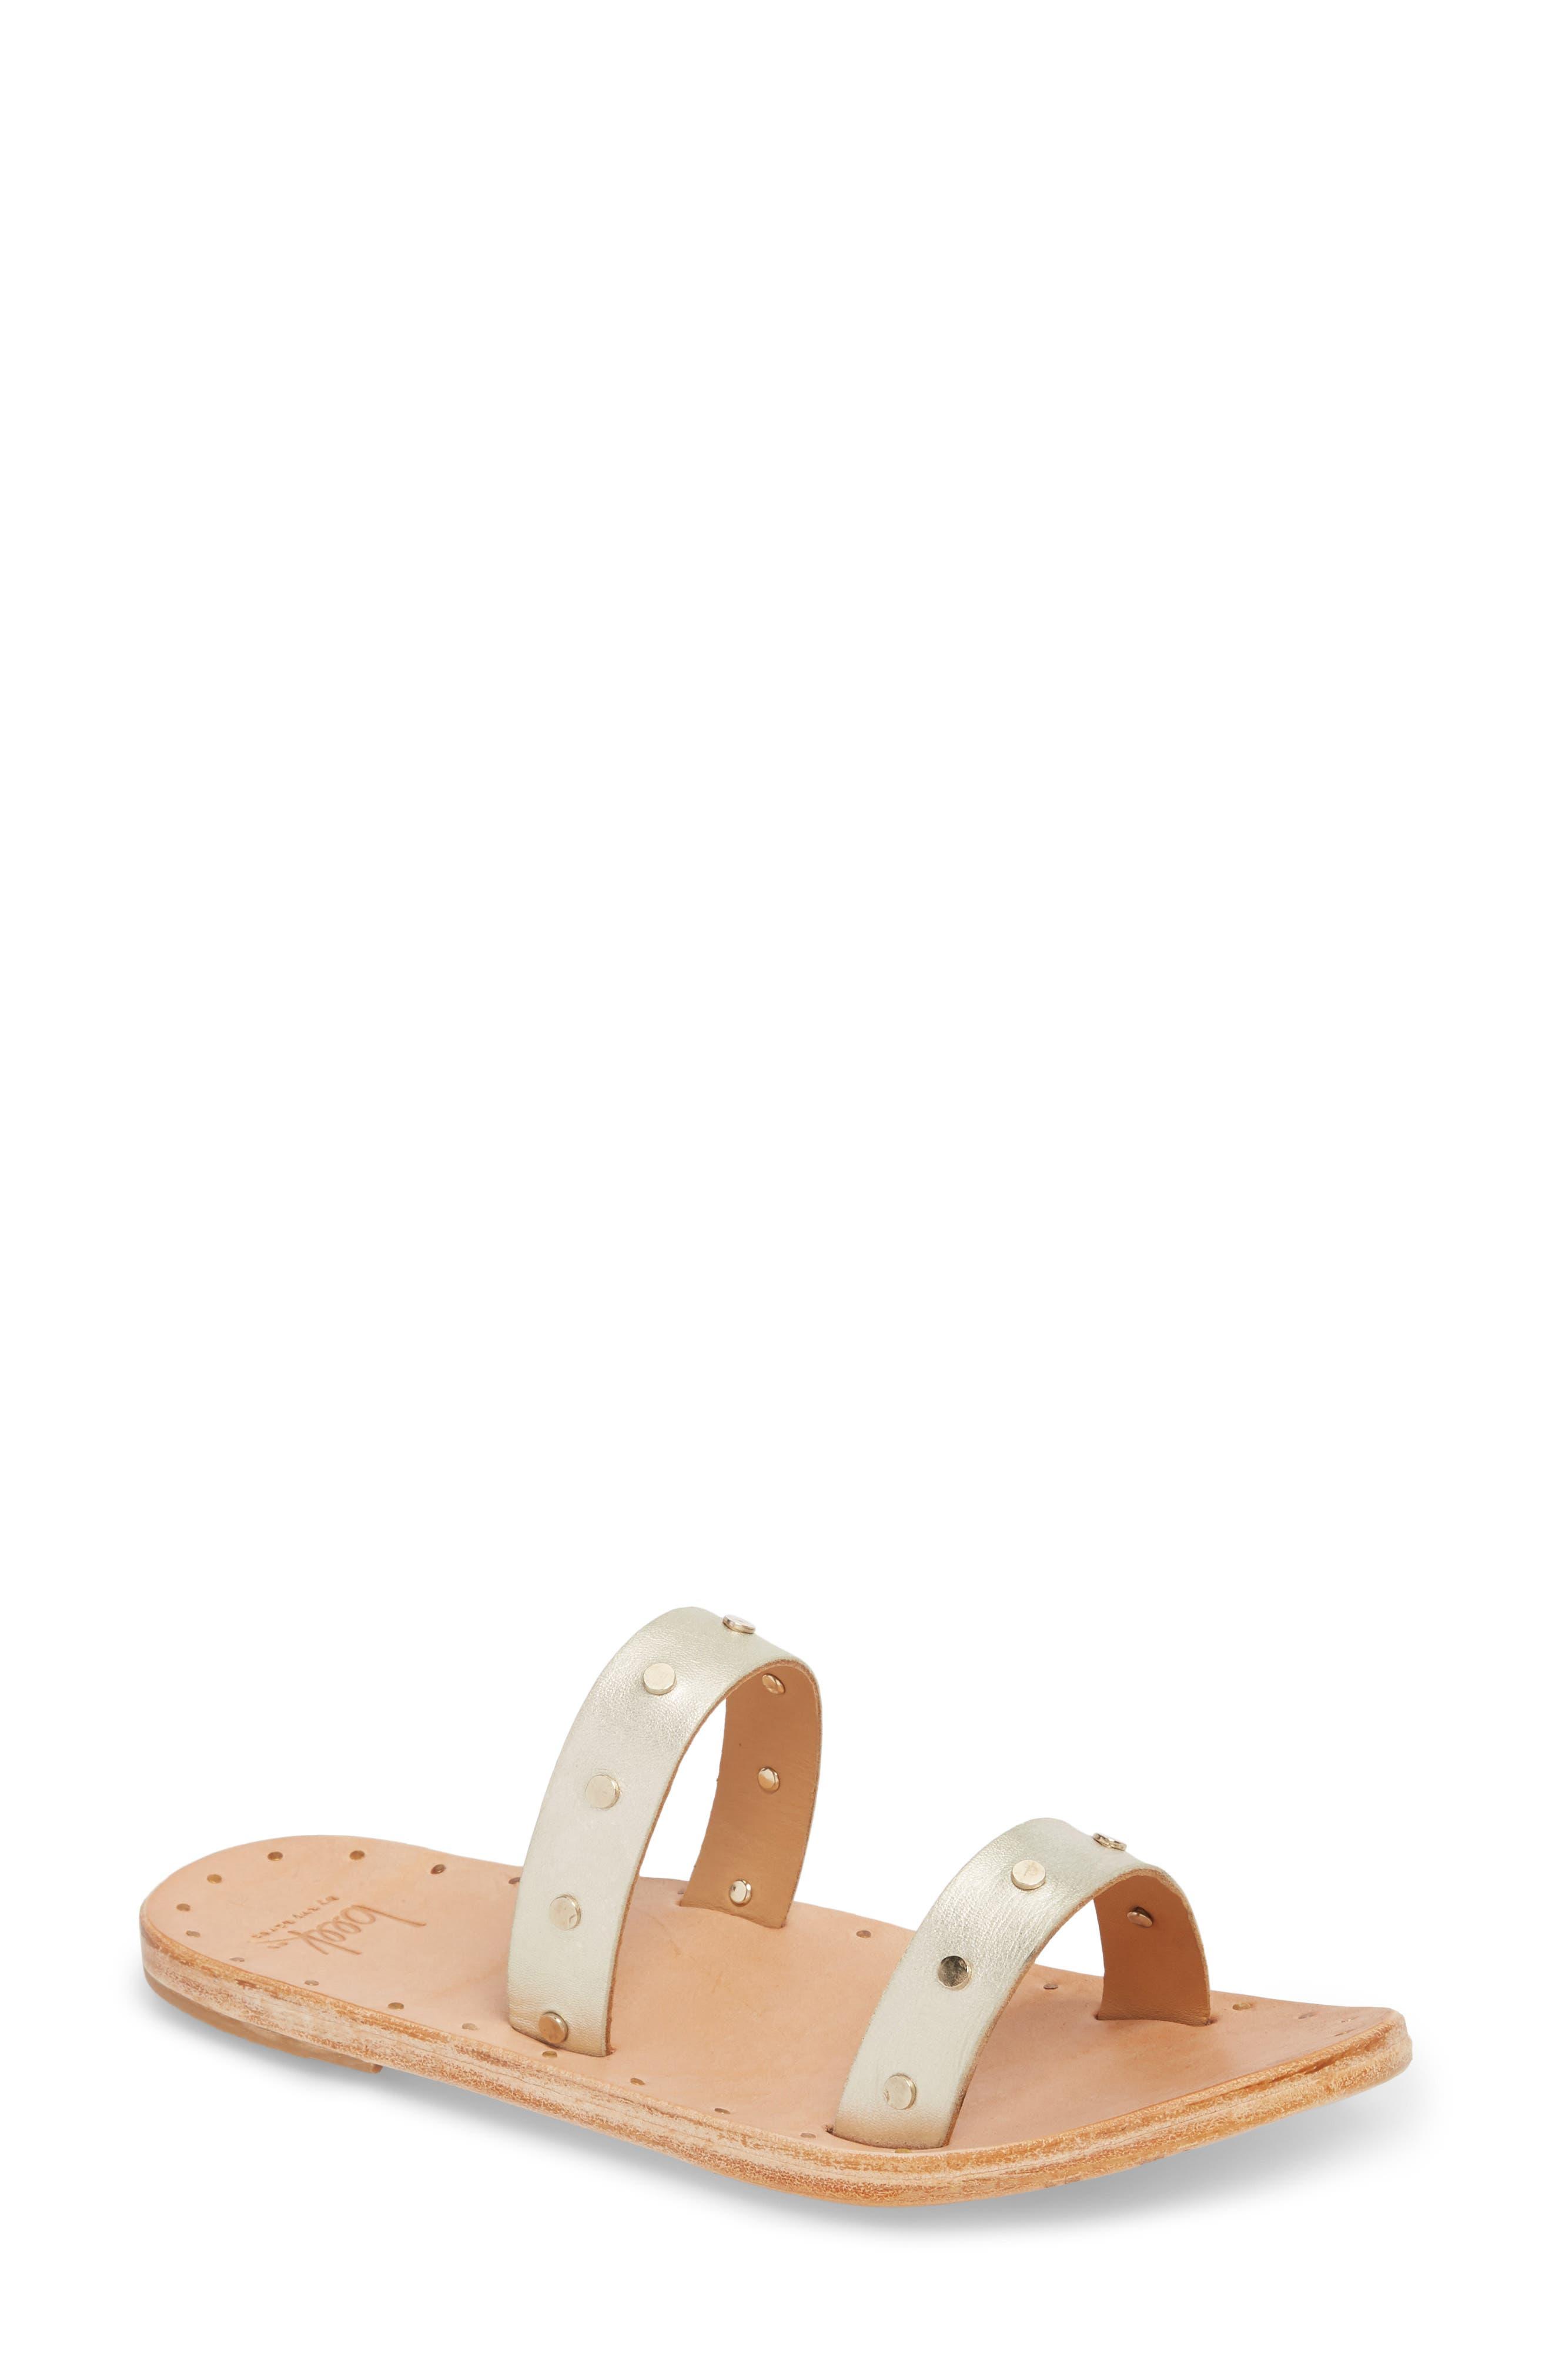 Woodpecker Studded Slide Sandal,                             Main thumbnail 1, color,                             Platinum Gold/ Nat